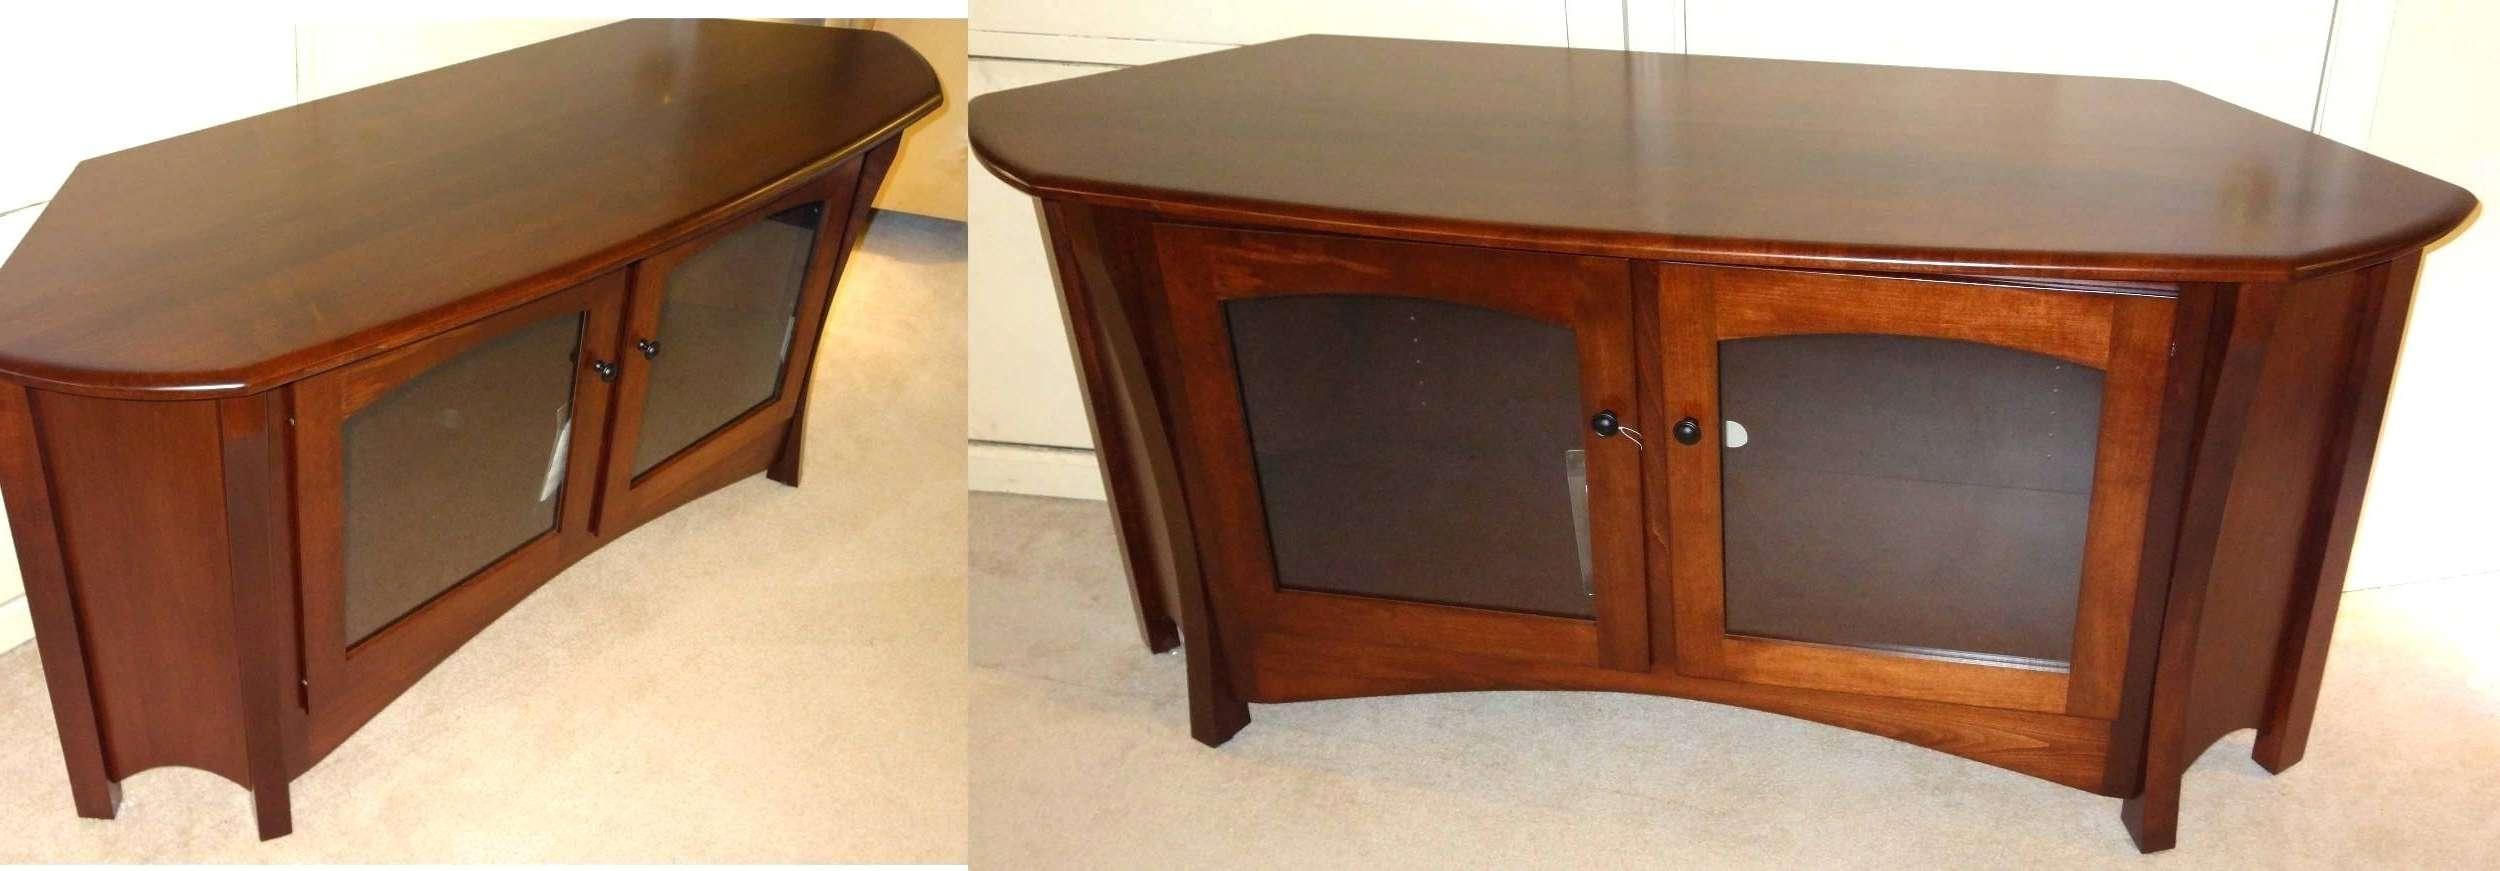 Cherry Wood Corner Tv Cabinet • Corner Cabinets For Cherry Wood Tv Cabinets (View 10 of 20)